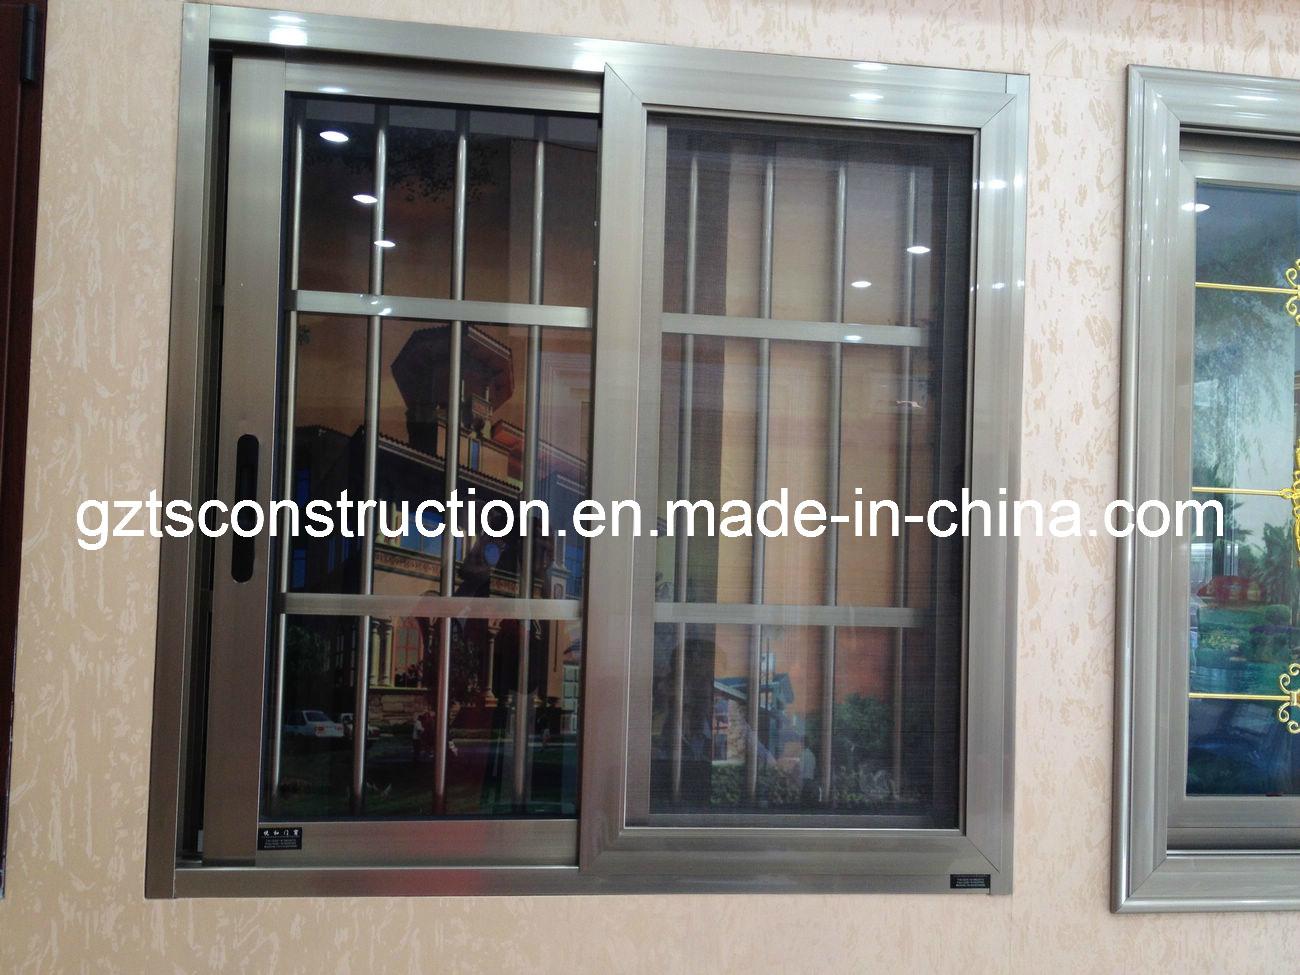 Aluminum Window Protection : Aluminum sliding window with security